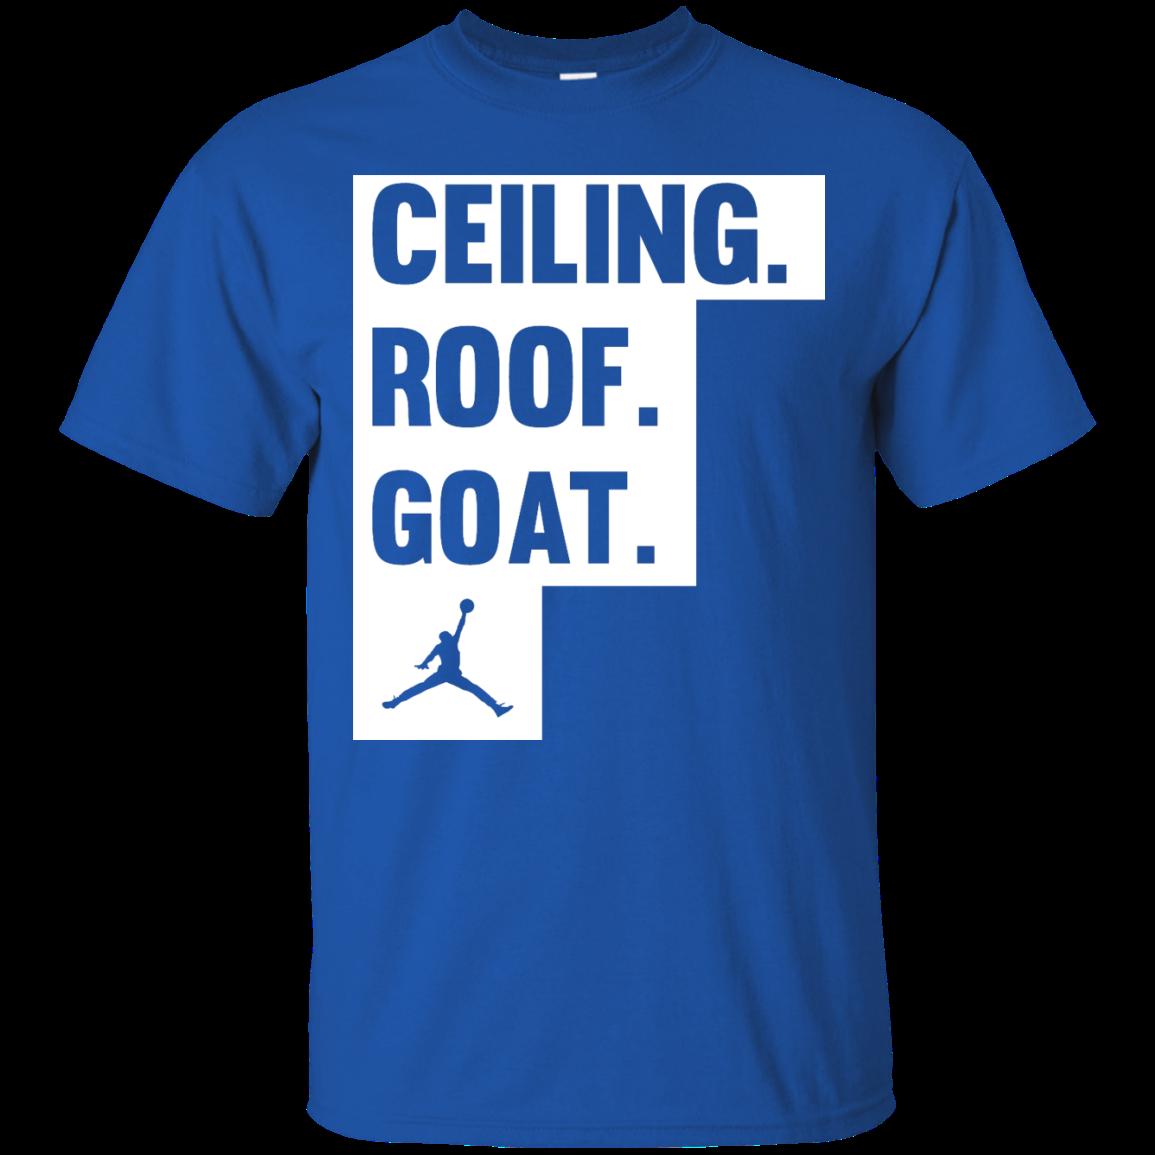 image 945px Jordan: Ceiling Roof Goat T Shirt, Hoodies, Tank